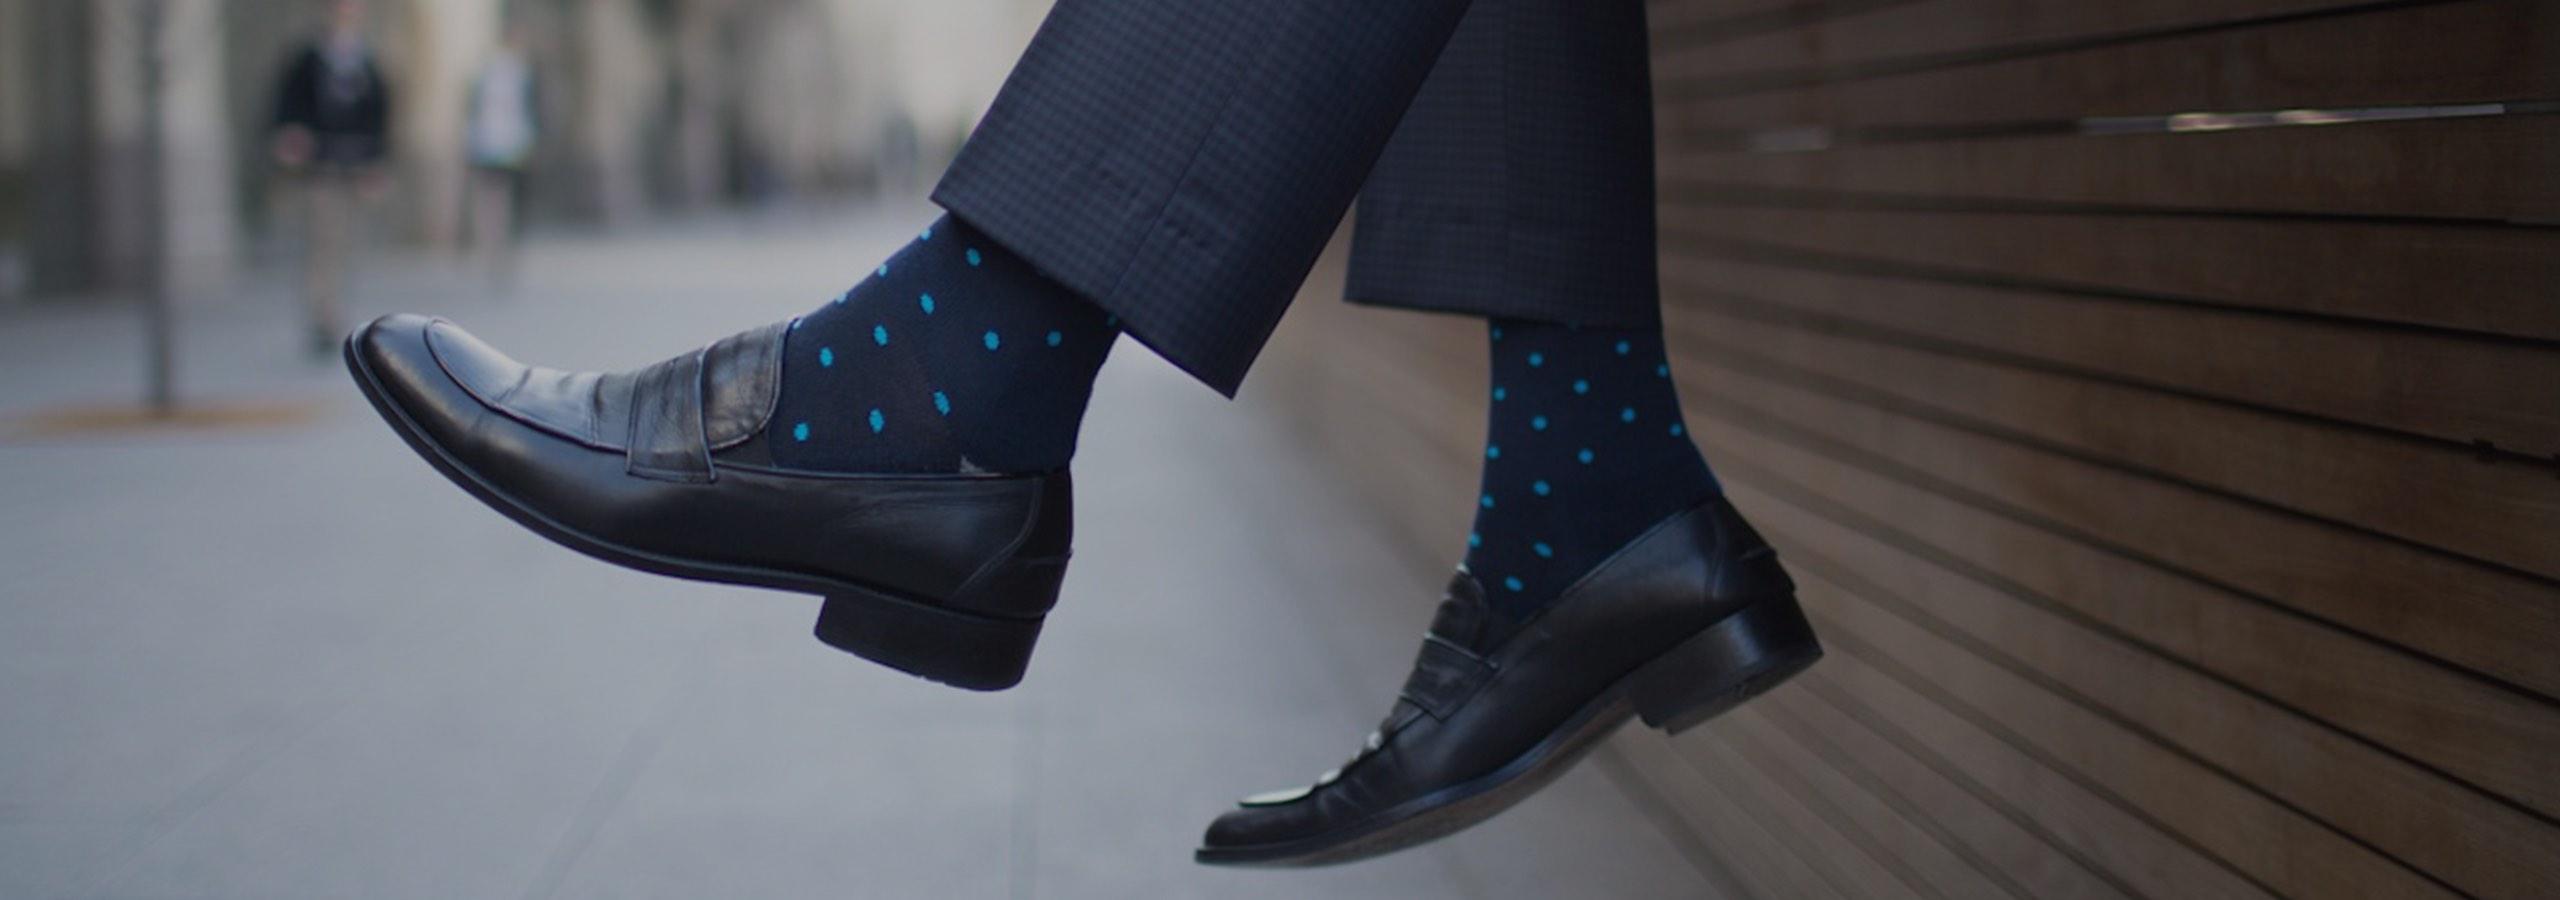 Stealth-Socks33